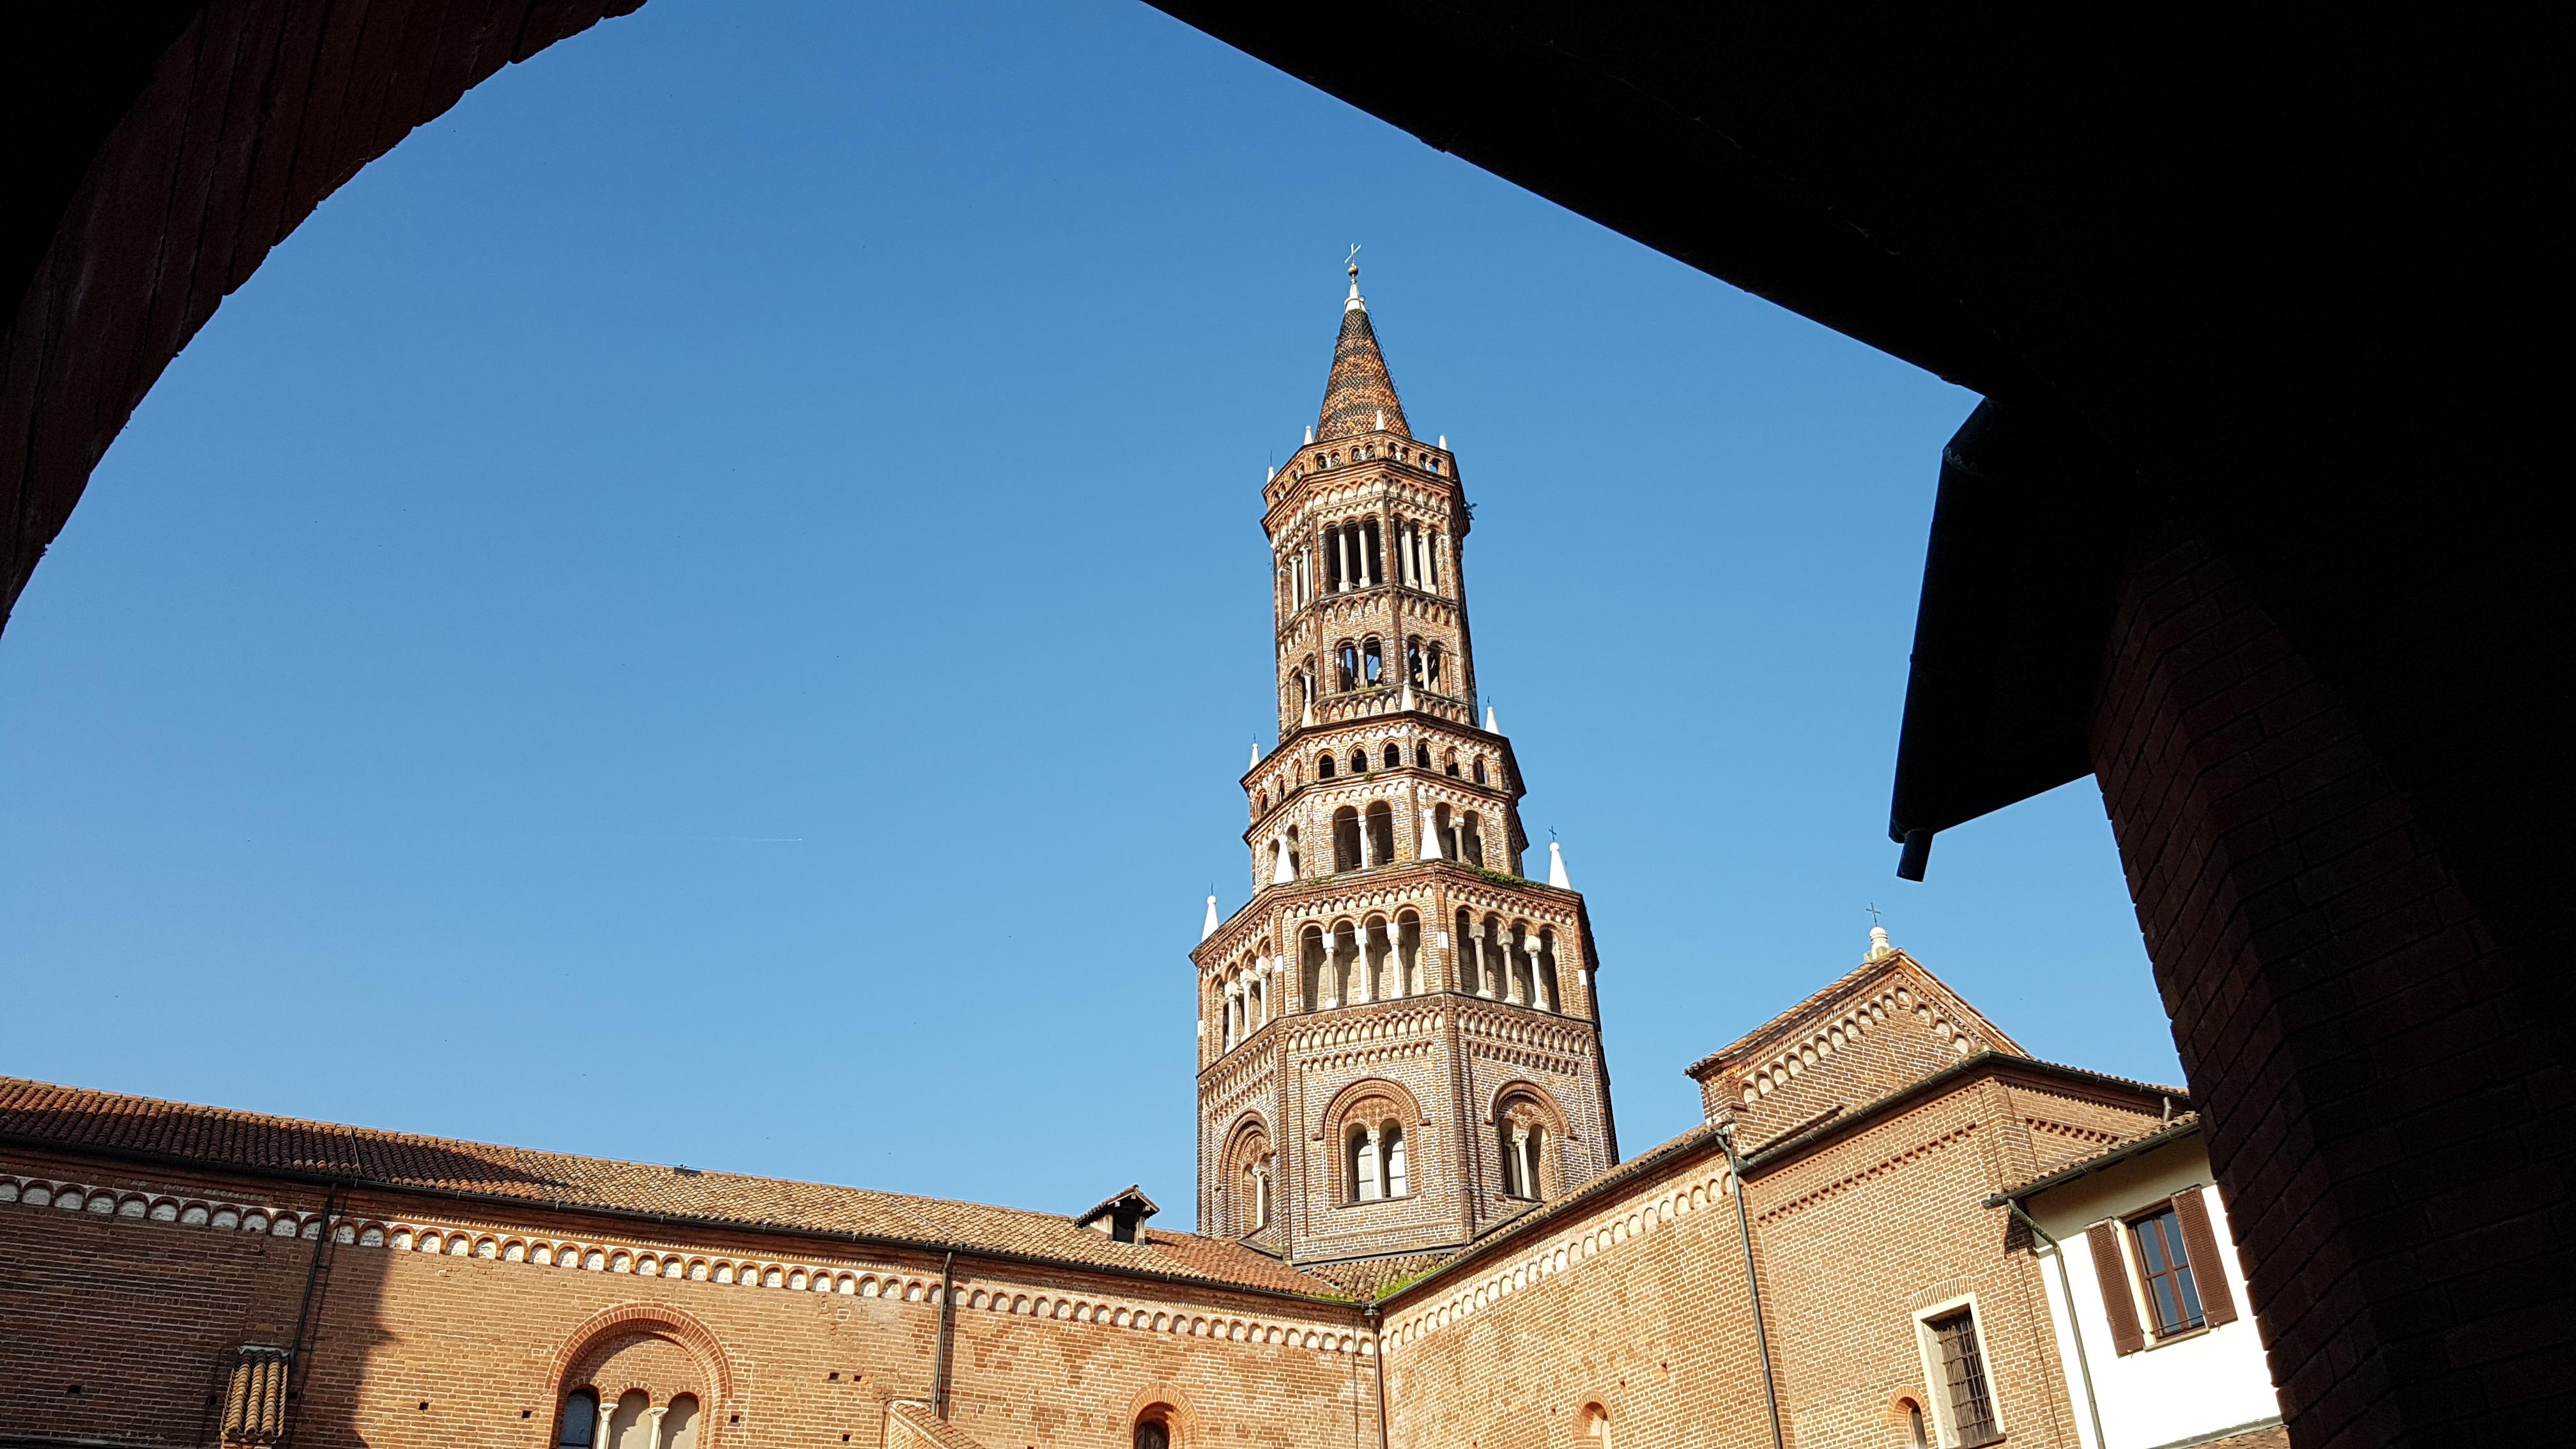 abbaziachiaravalle_torreCiribiriciaccola2